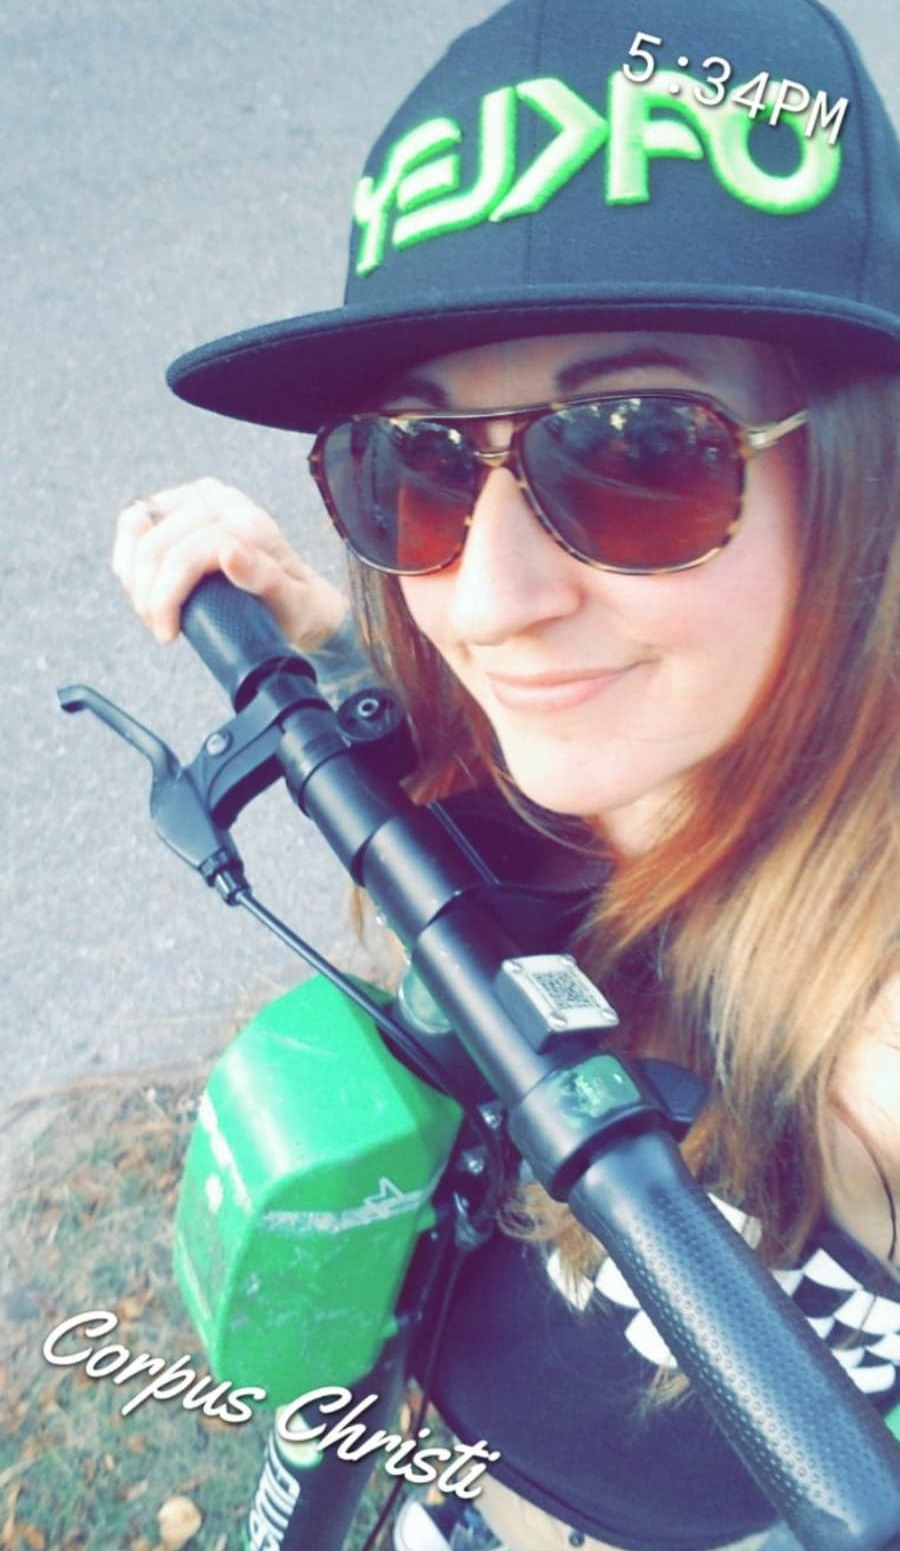 scooter%20eli_edited